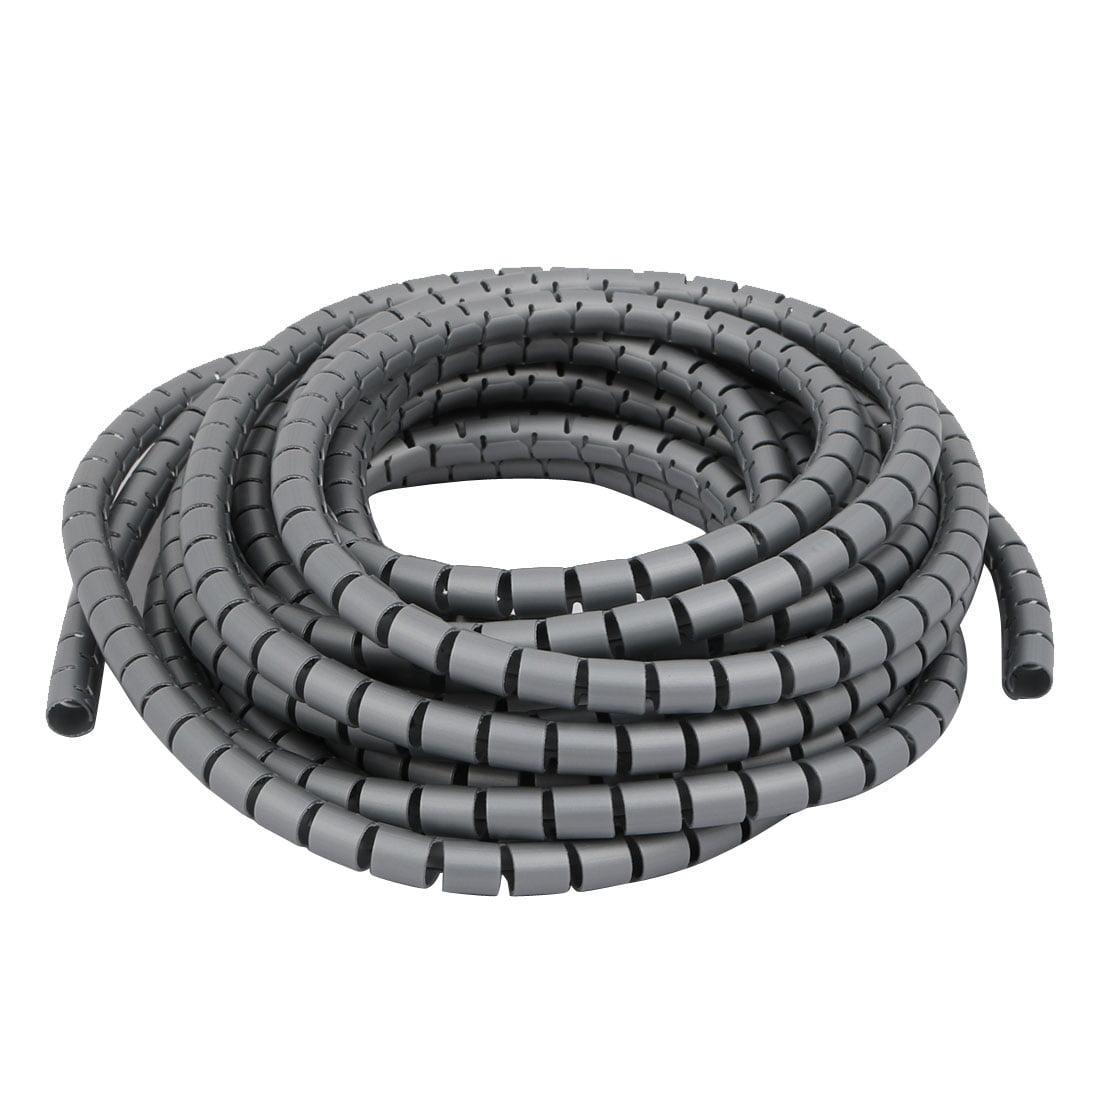 Unique Bargains 10mm Dia Flexible Spiral Tube Cable Wire Wrap Gray ...